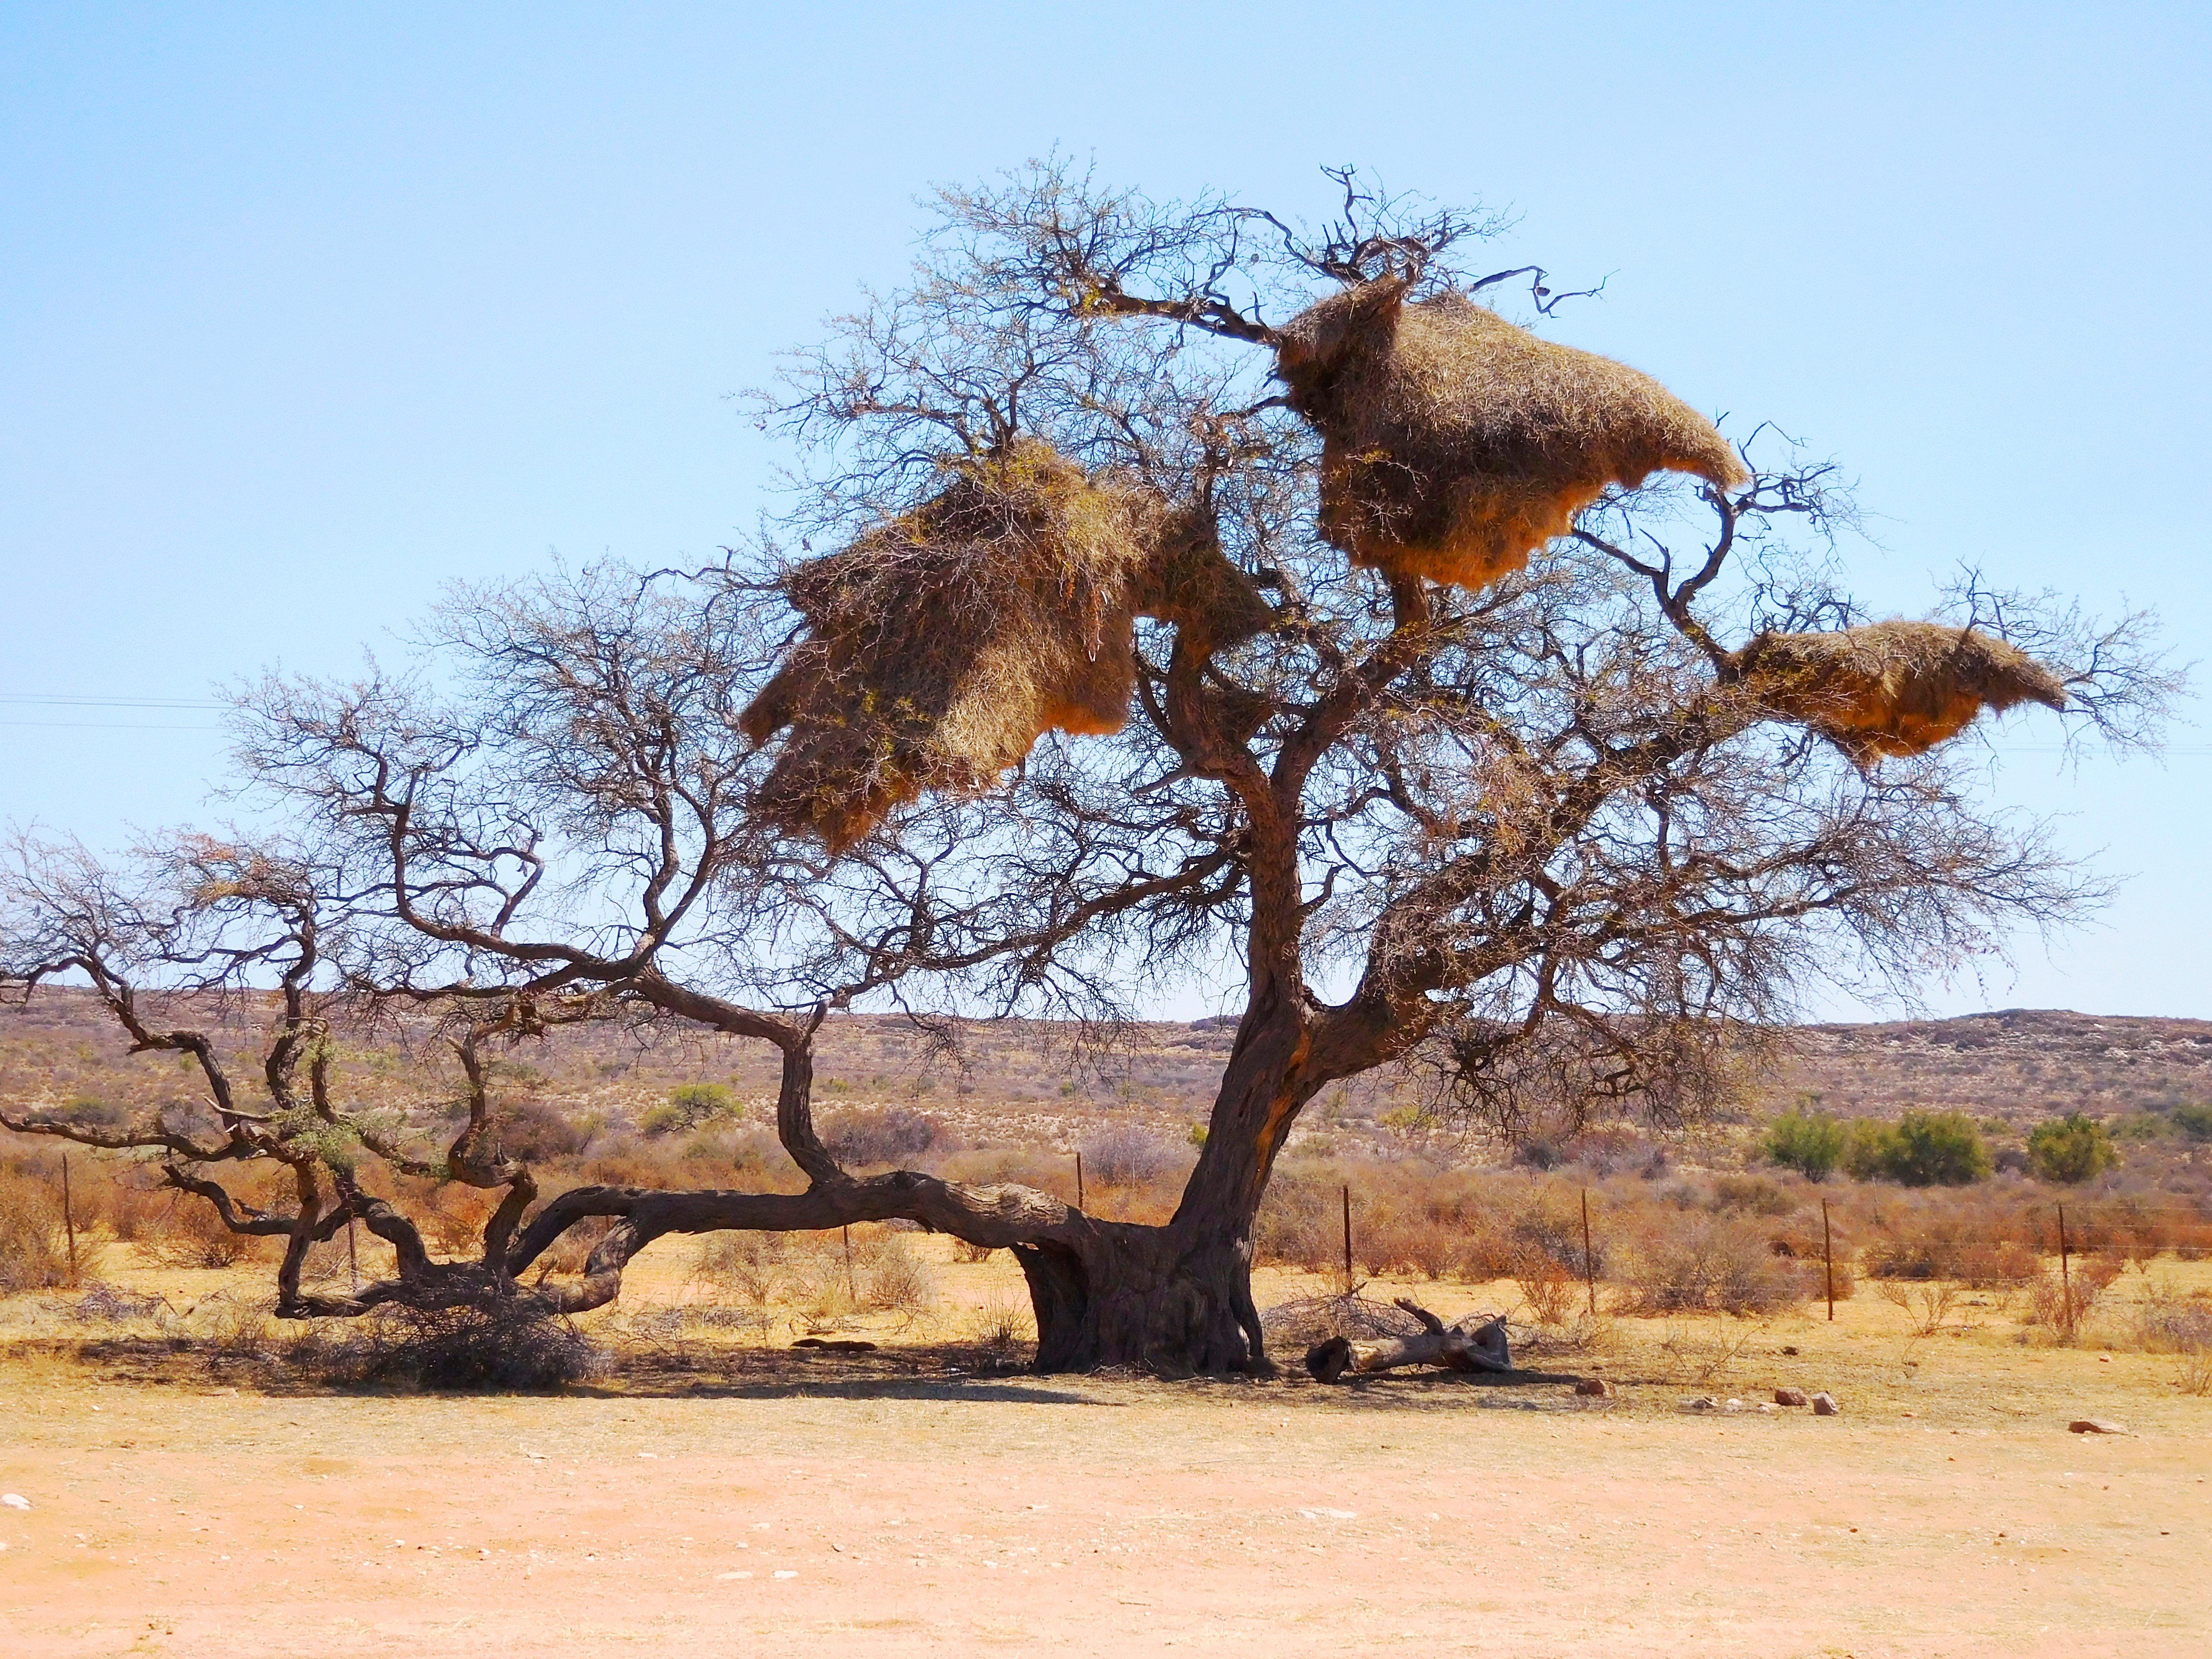 Imposante Weber-Vogel-Nester im Outback Namibias